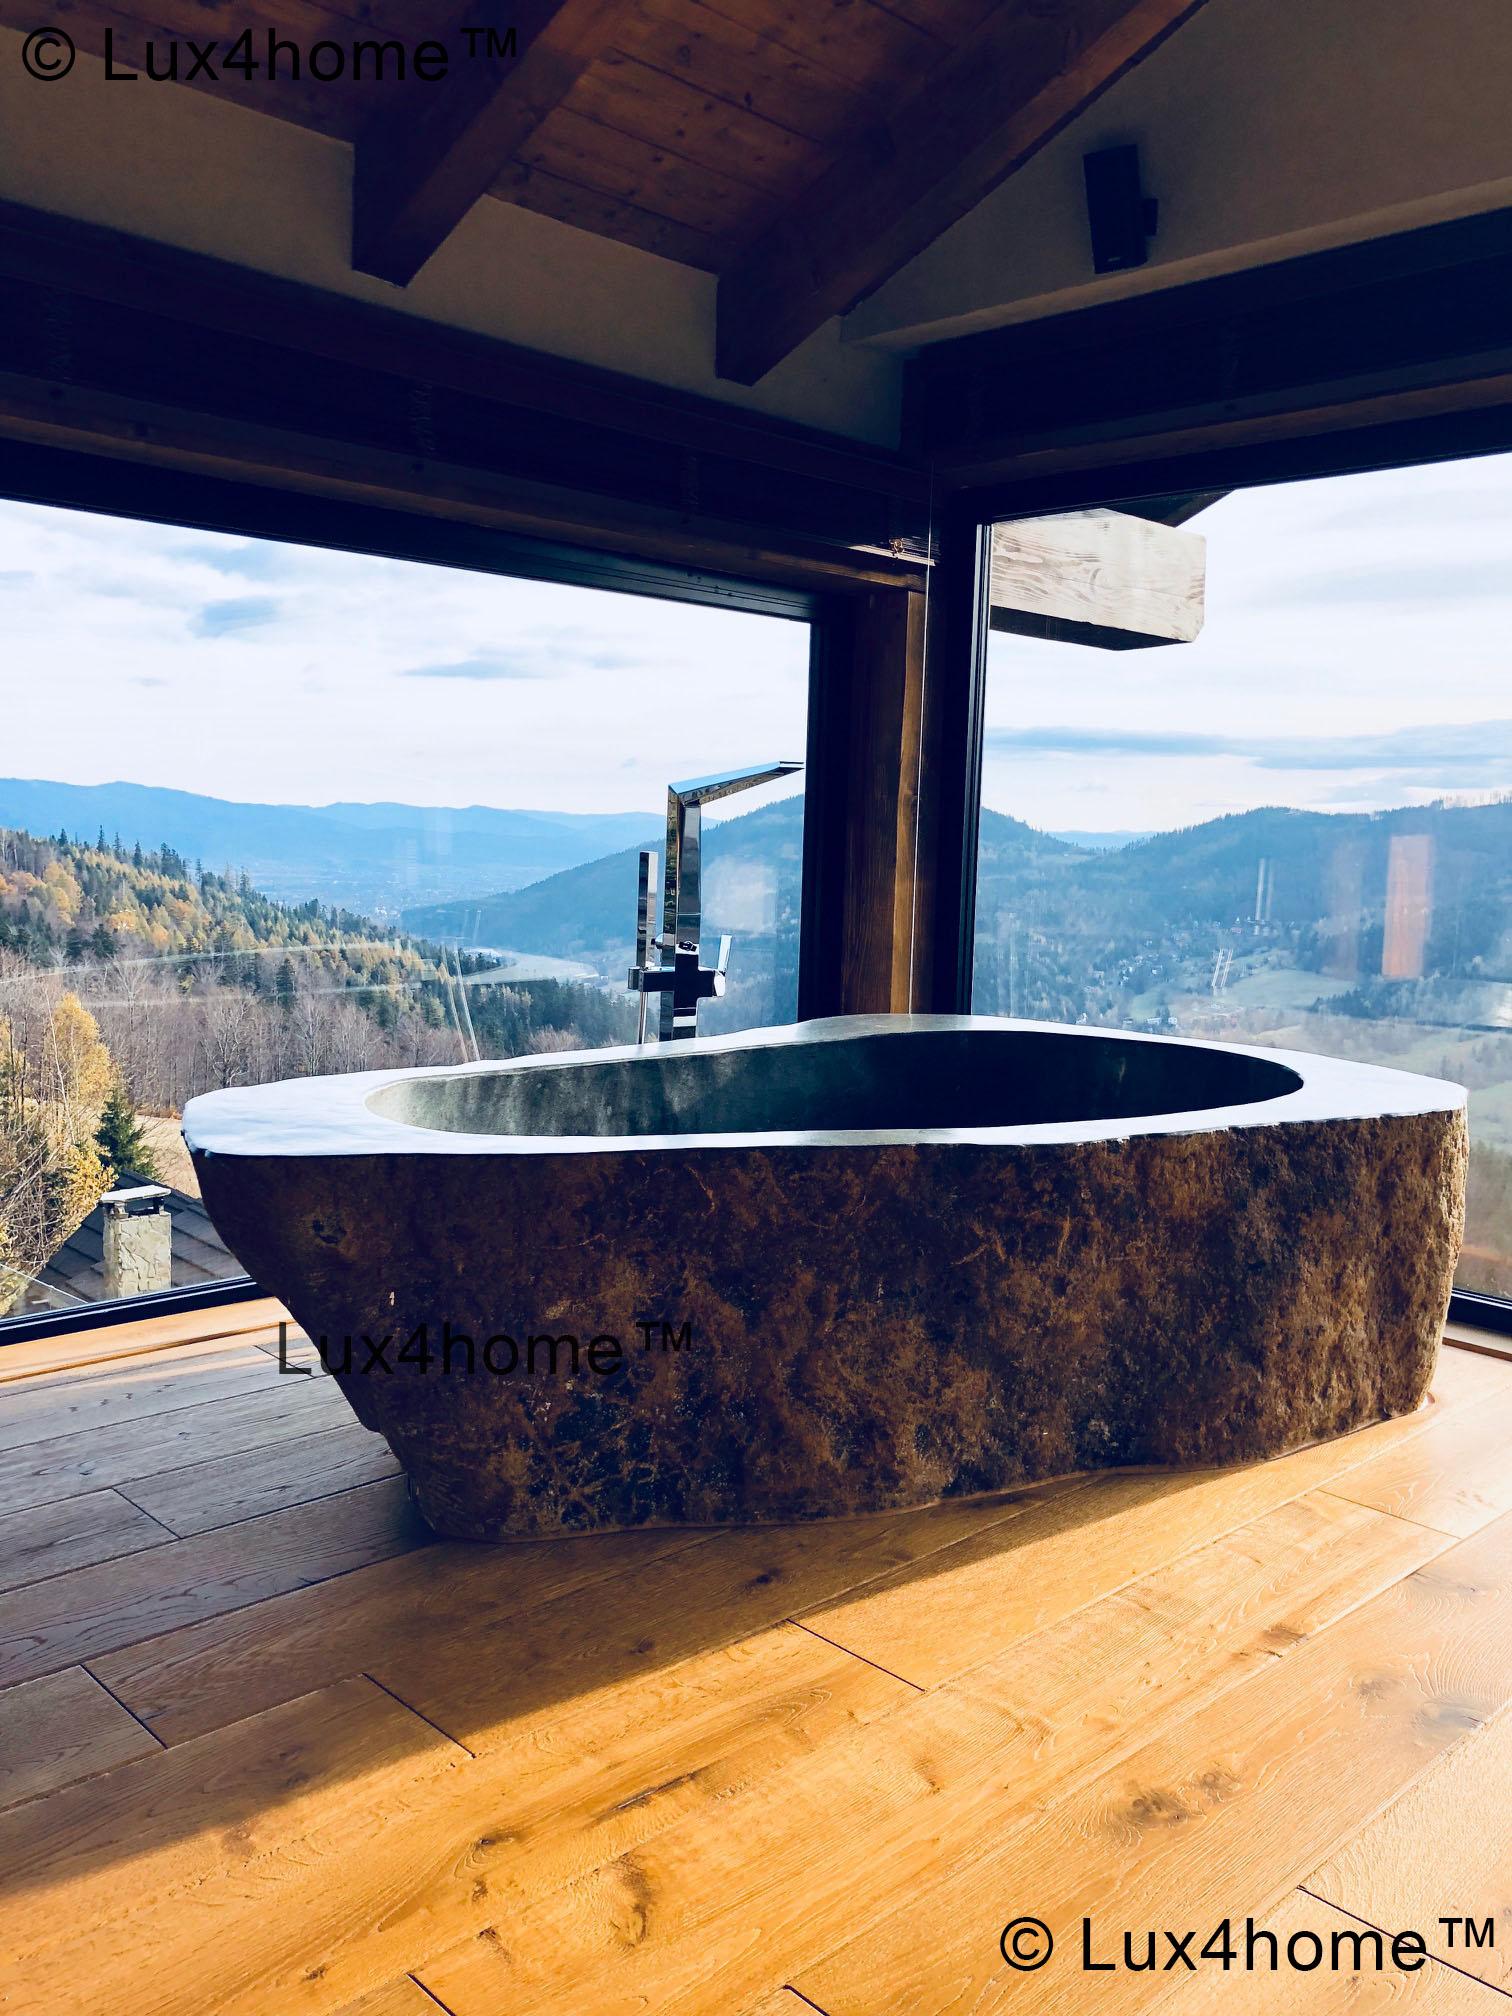 River Stone Bathtub - Natural stone bathtubs